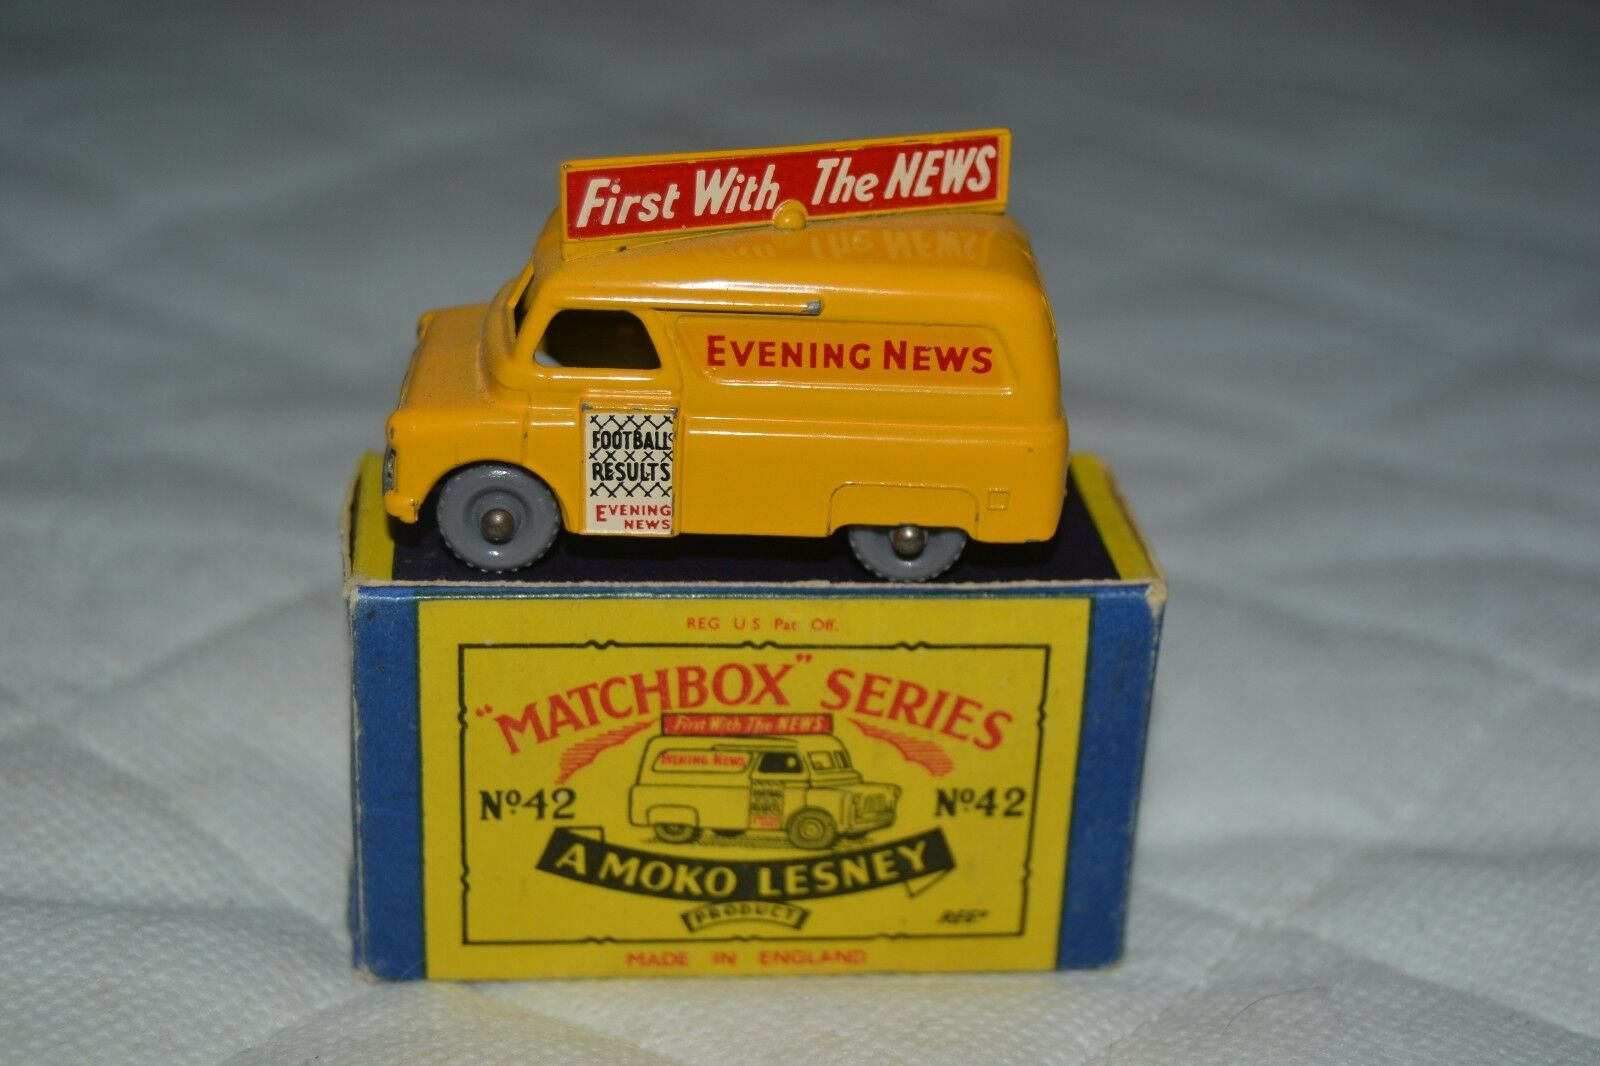 Matchbox lesney series N42 Evening News Van